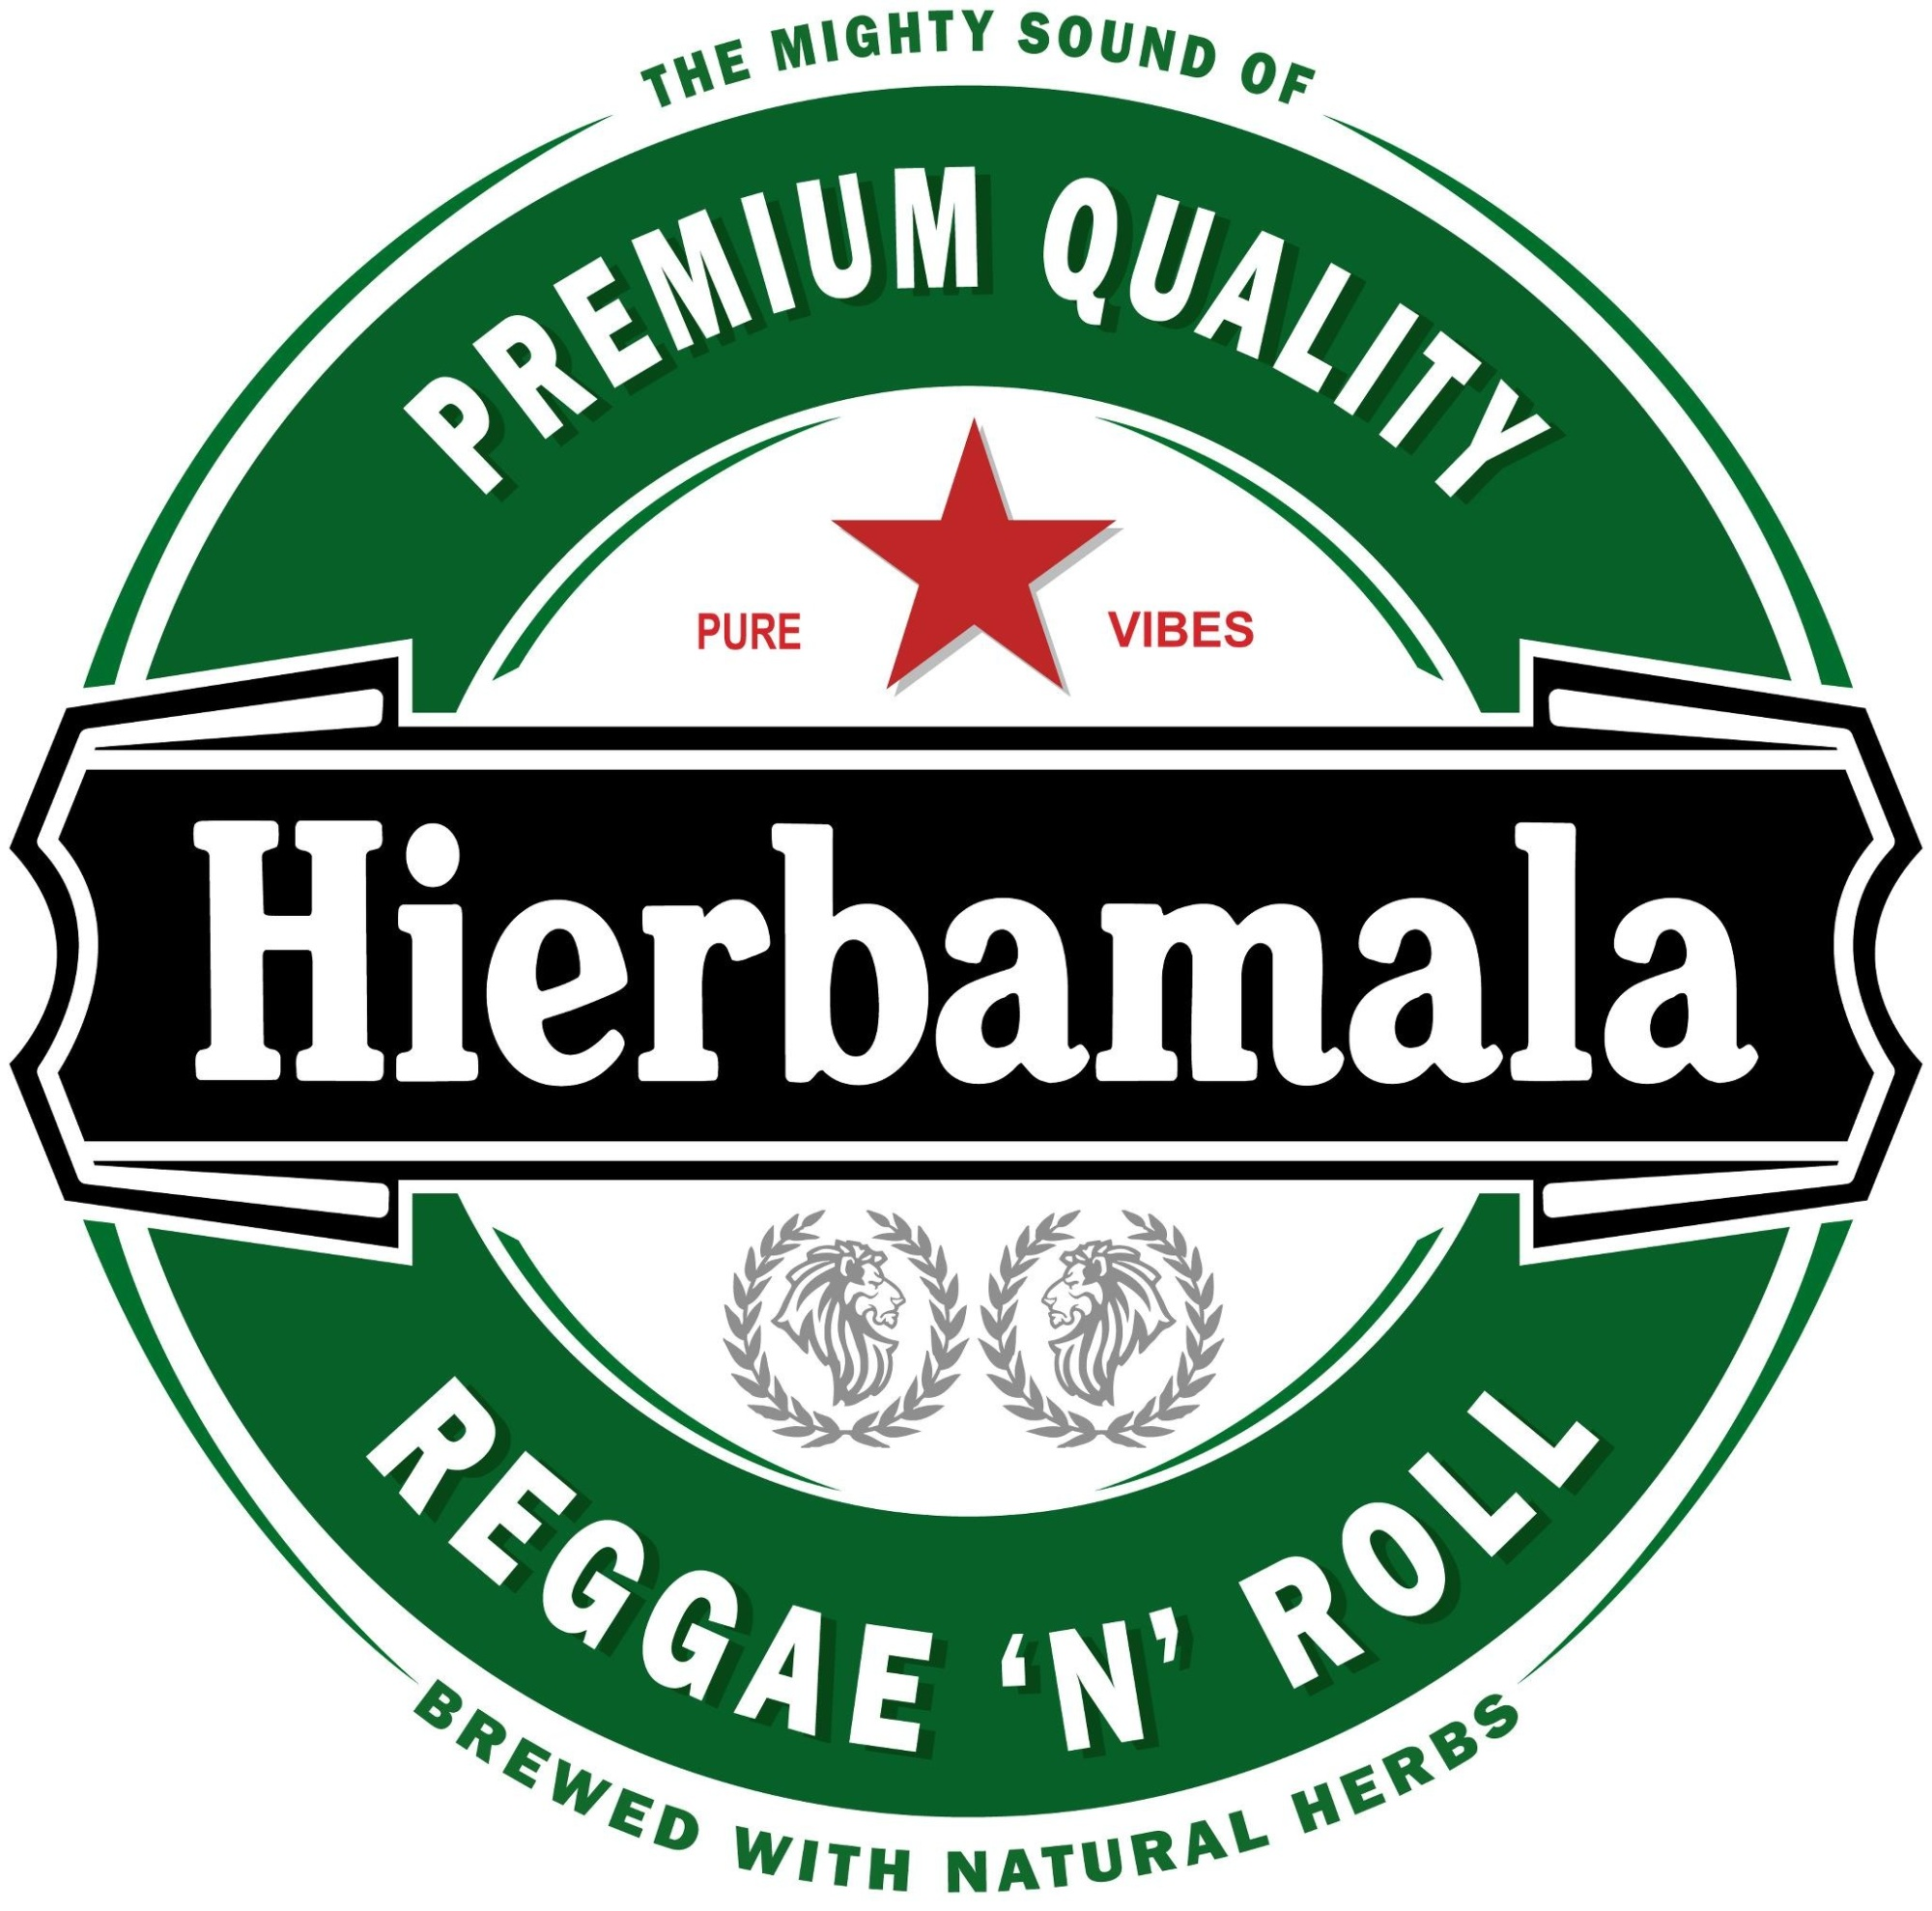 hierbamala-reggae-patchanka-band-italia